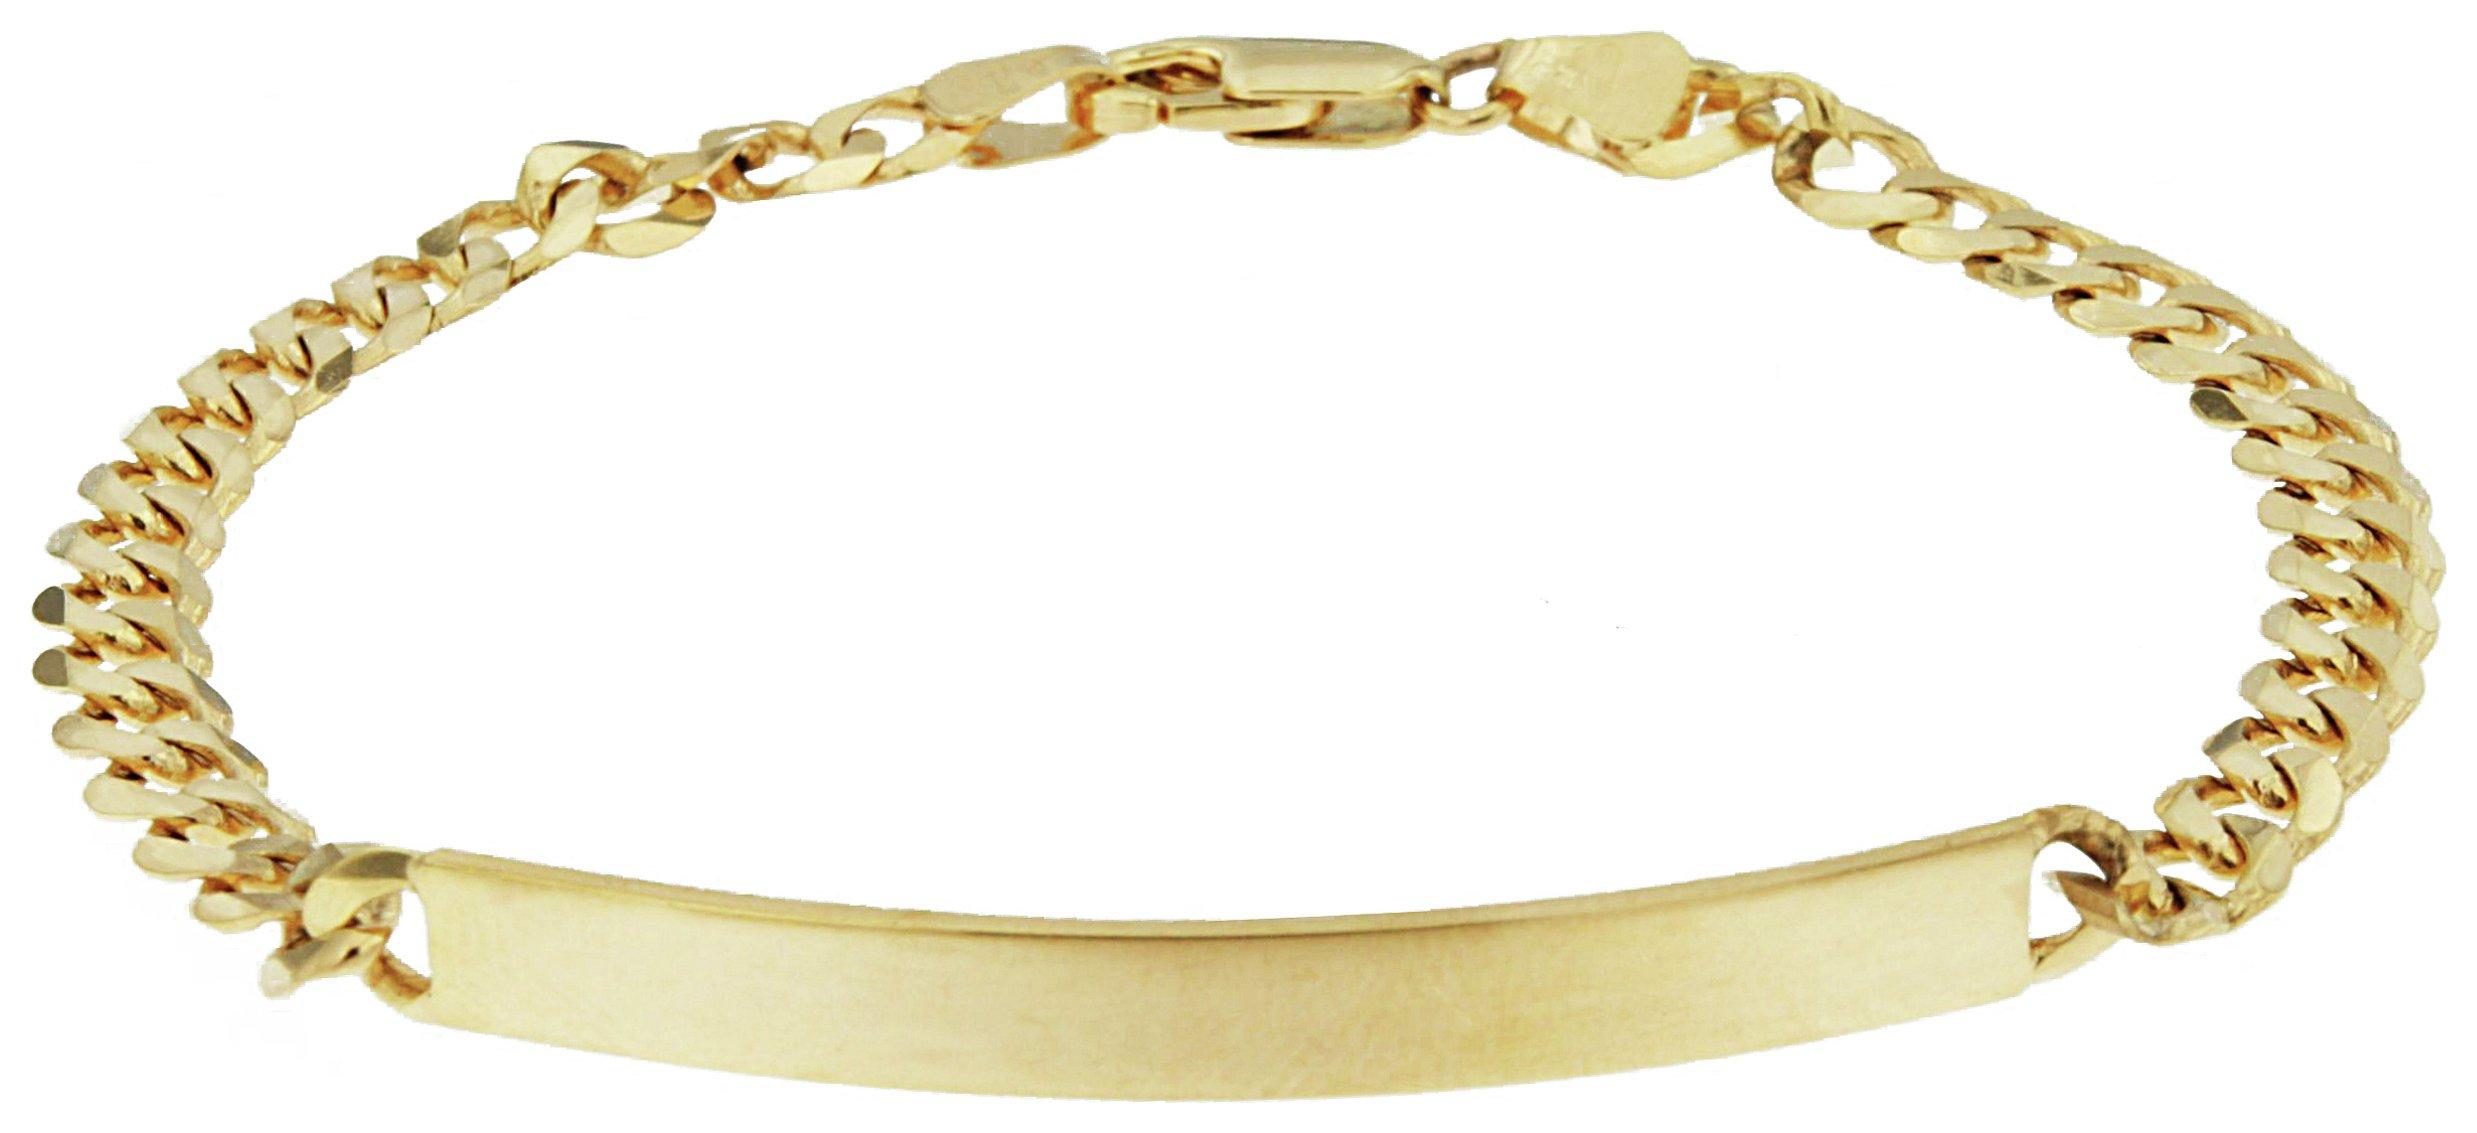 Image of Bracci - 9 Carat Gold - Curb ID Bracelet.